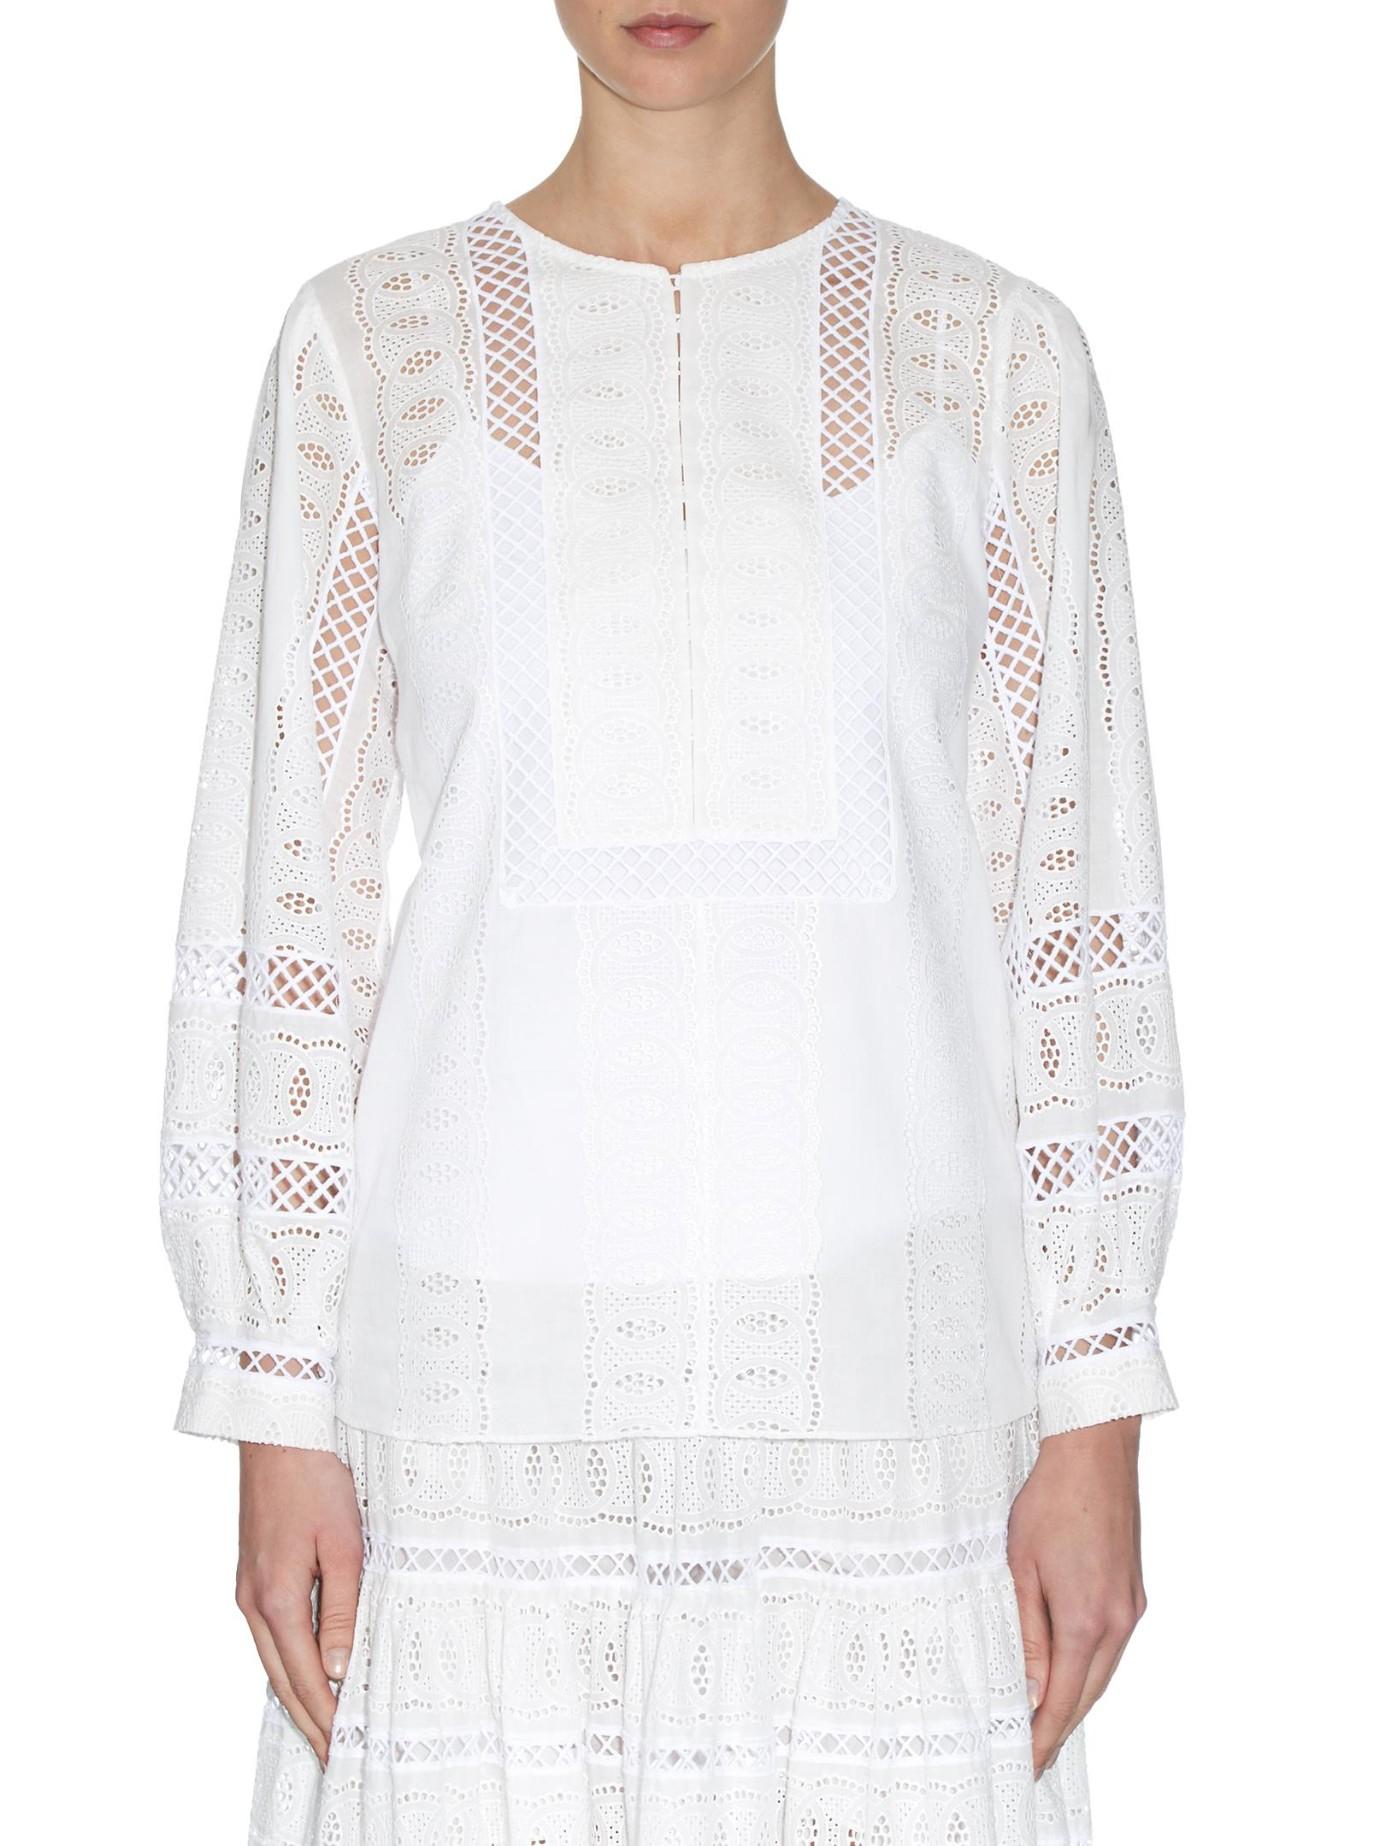 oscar de la renta broderie anglaise cotton blouse in white lyst. Black Bedroom Furniture Sets. Home Design Ideas